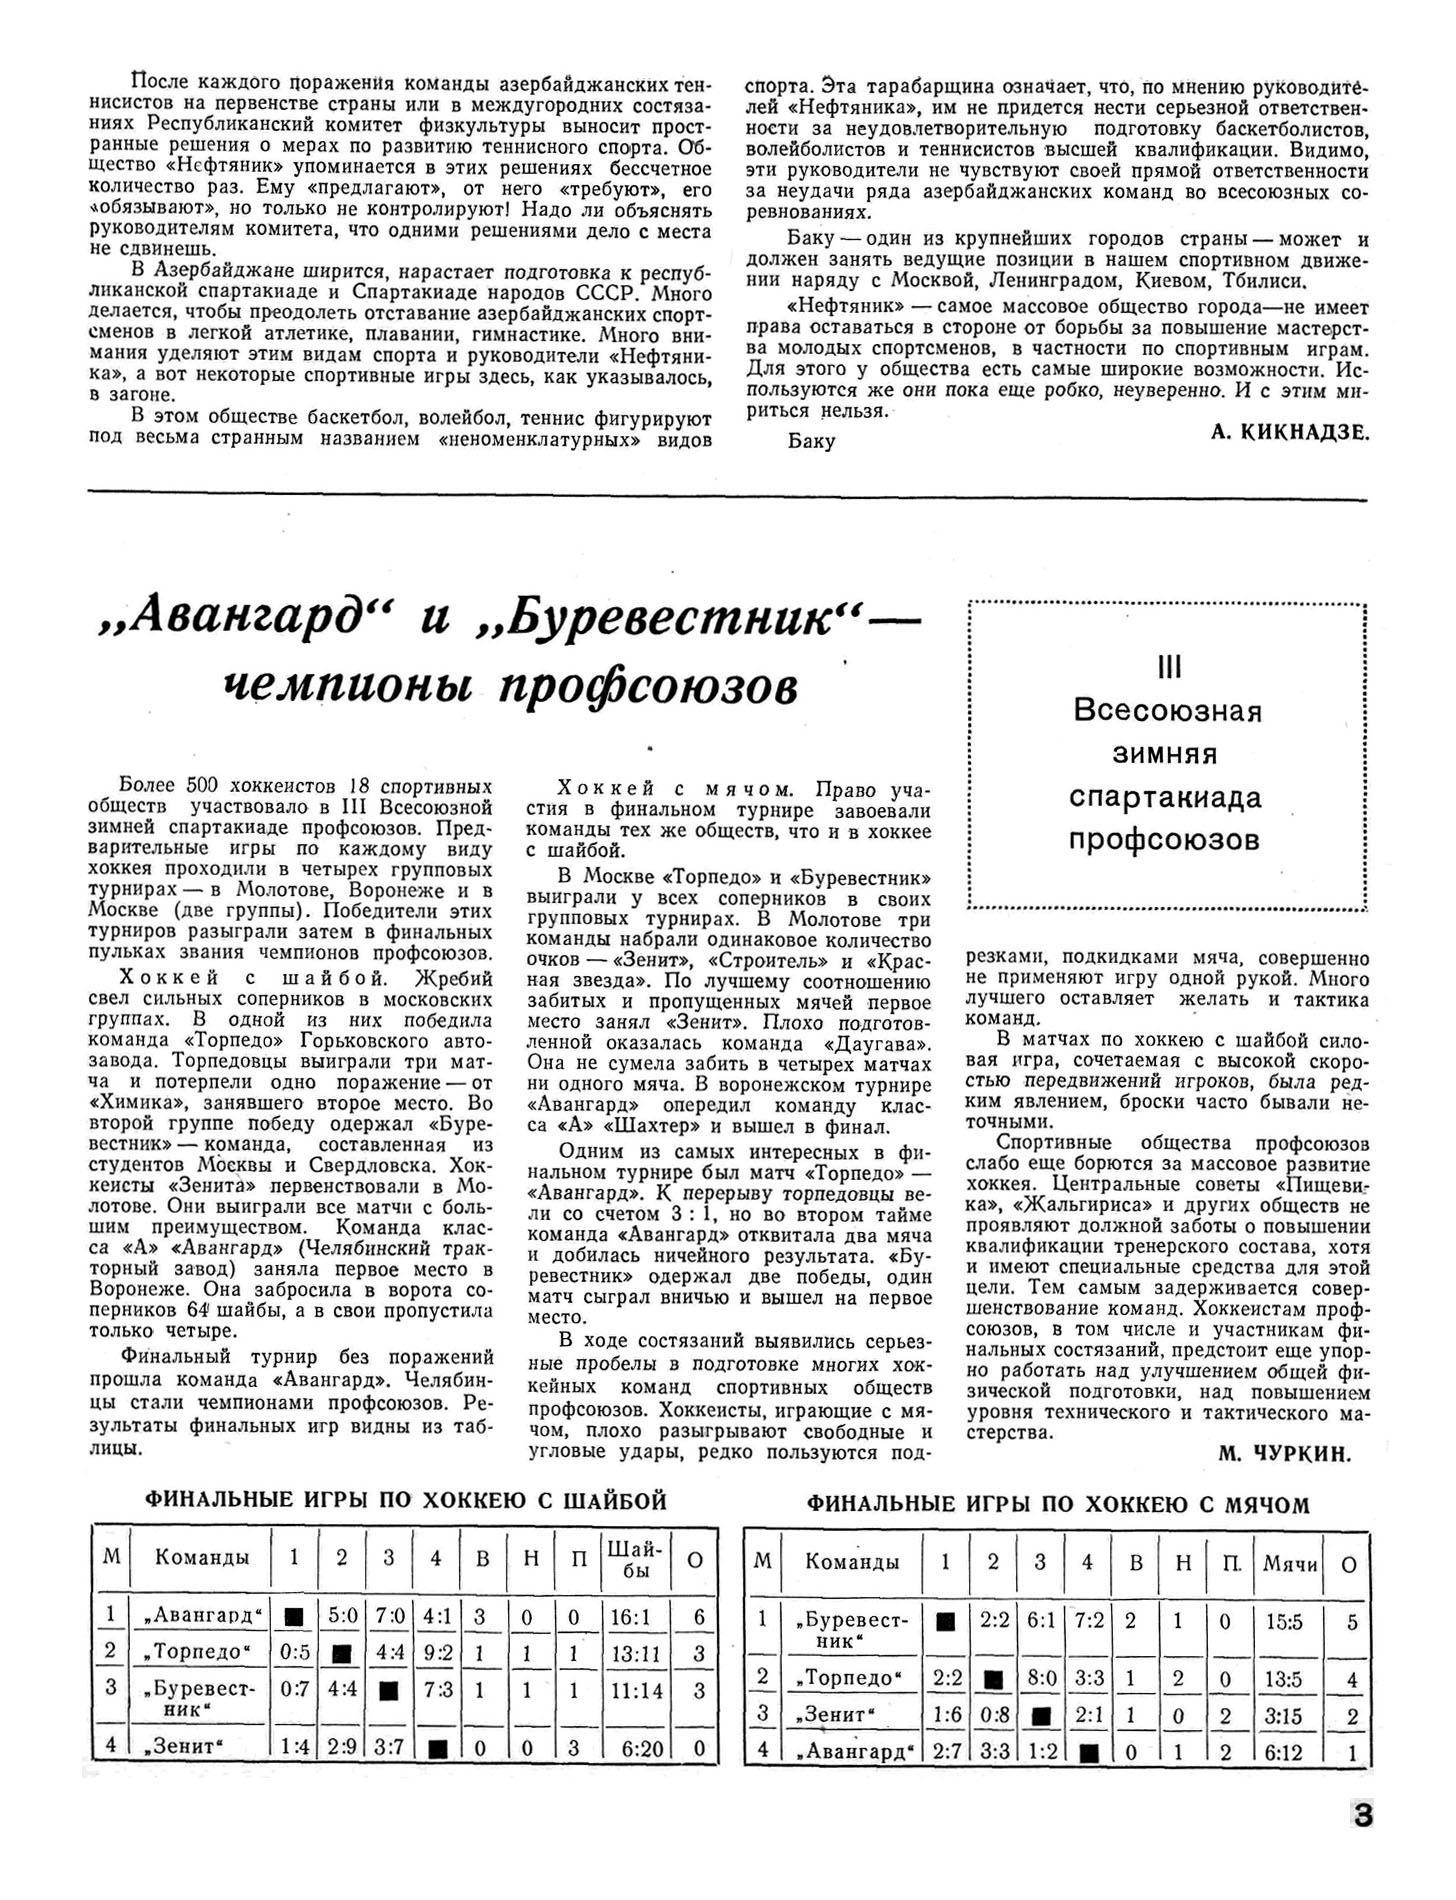 СИ_1956_3_3.jpg